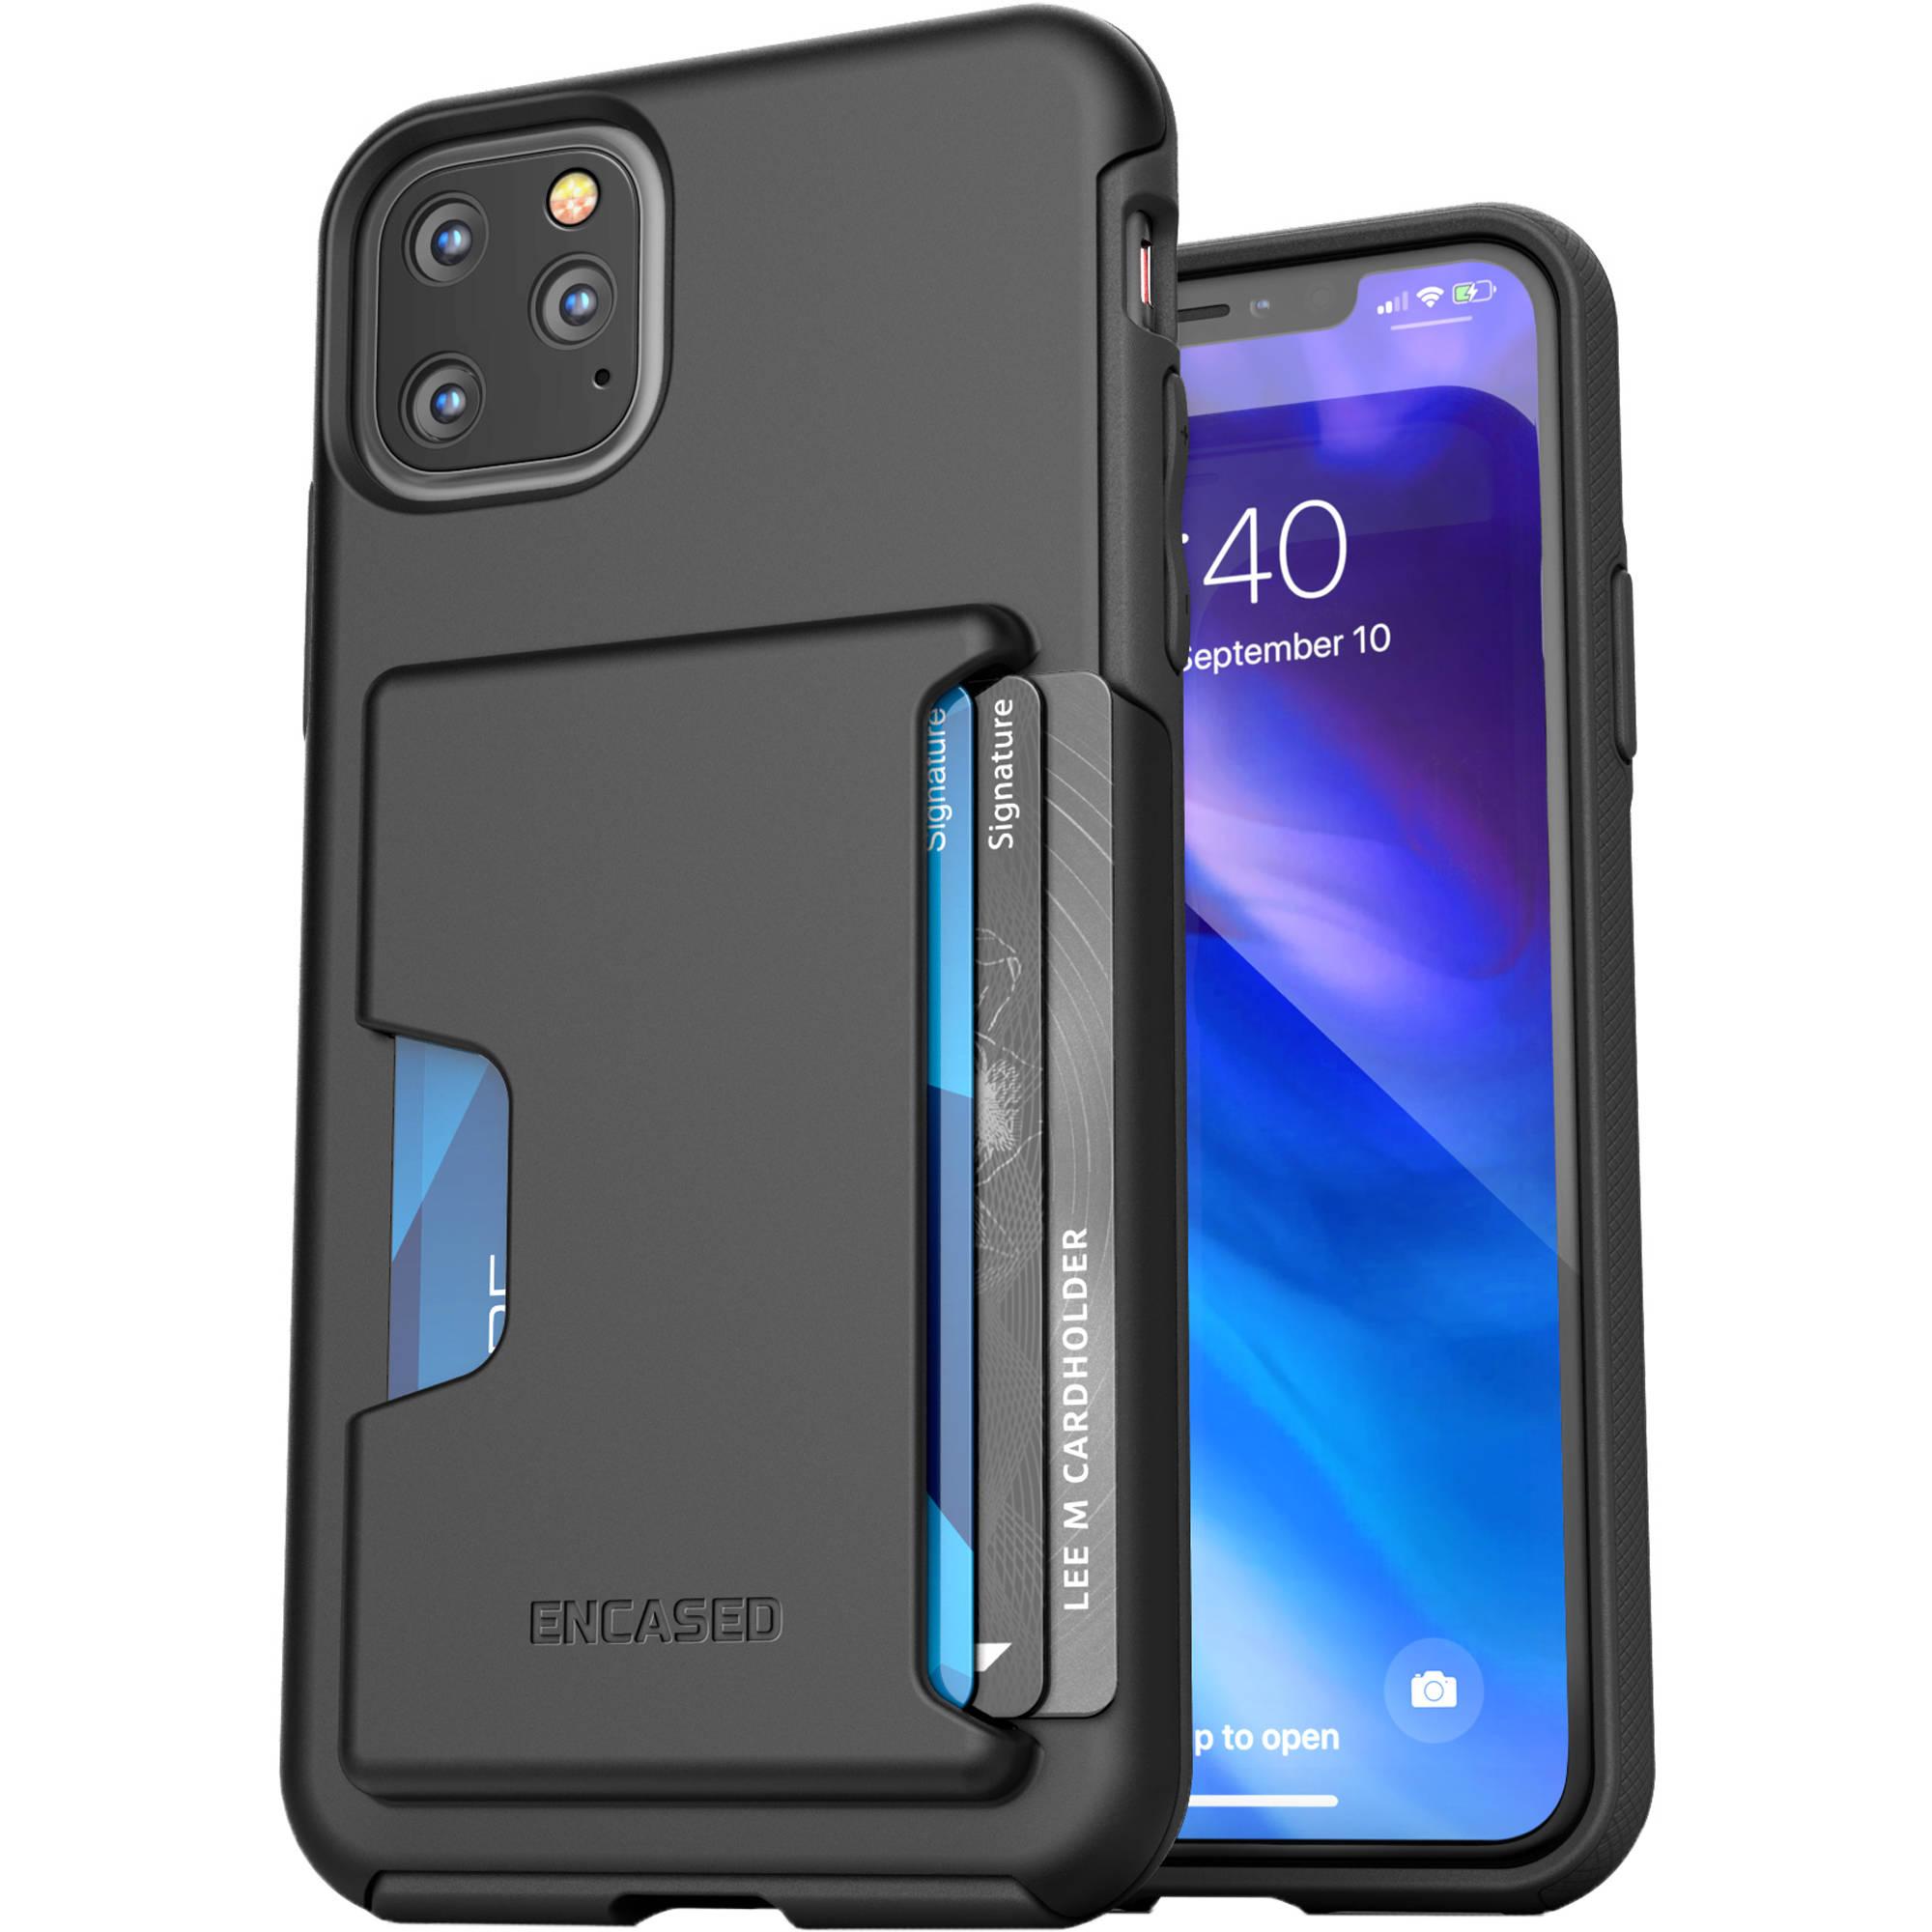 Encased Phantom Wallet Case for iPhone 11 Pro Max (Black)